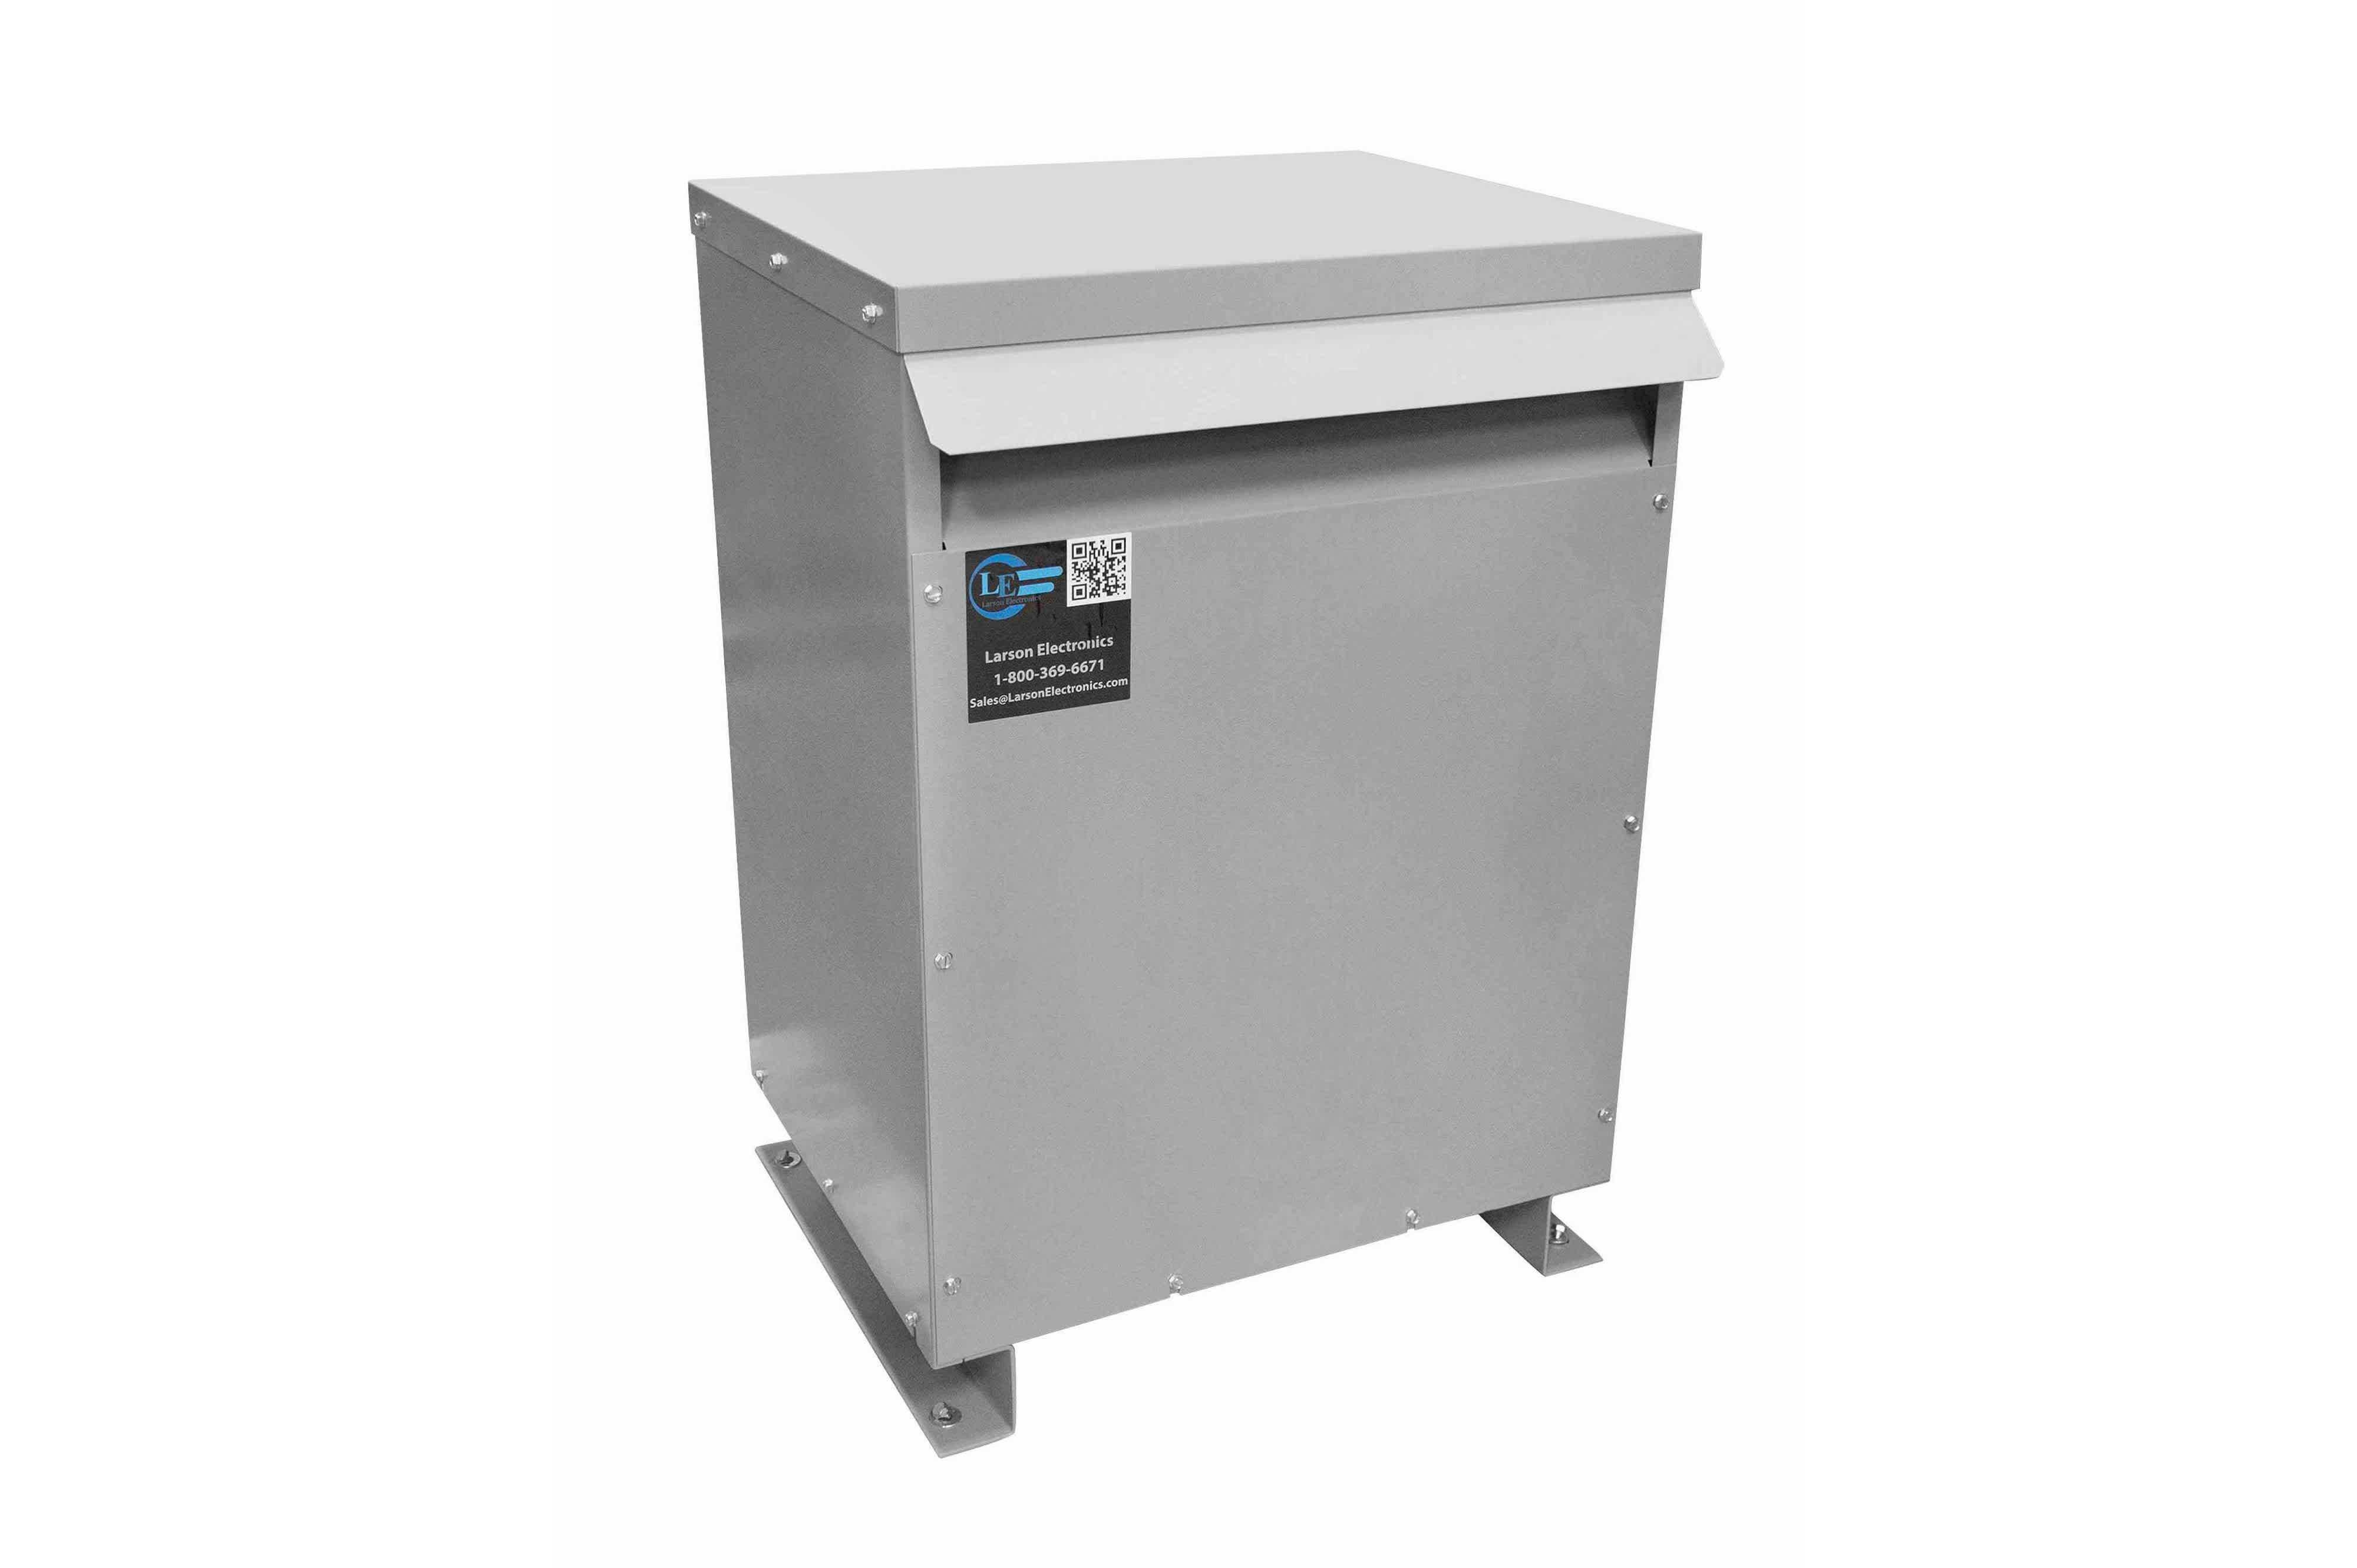 137.5 kVA 3PH Isolation Transformer, 460V Wye Primary, 400Y/231 Wye-N Secondary, N3R, Ventilated, 60 Hz